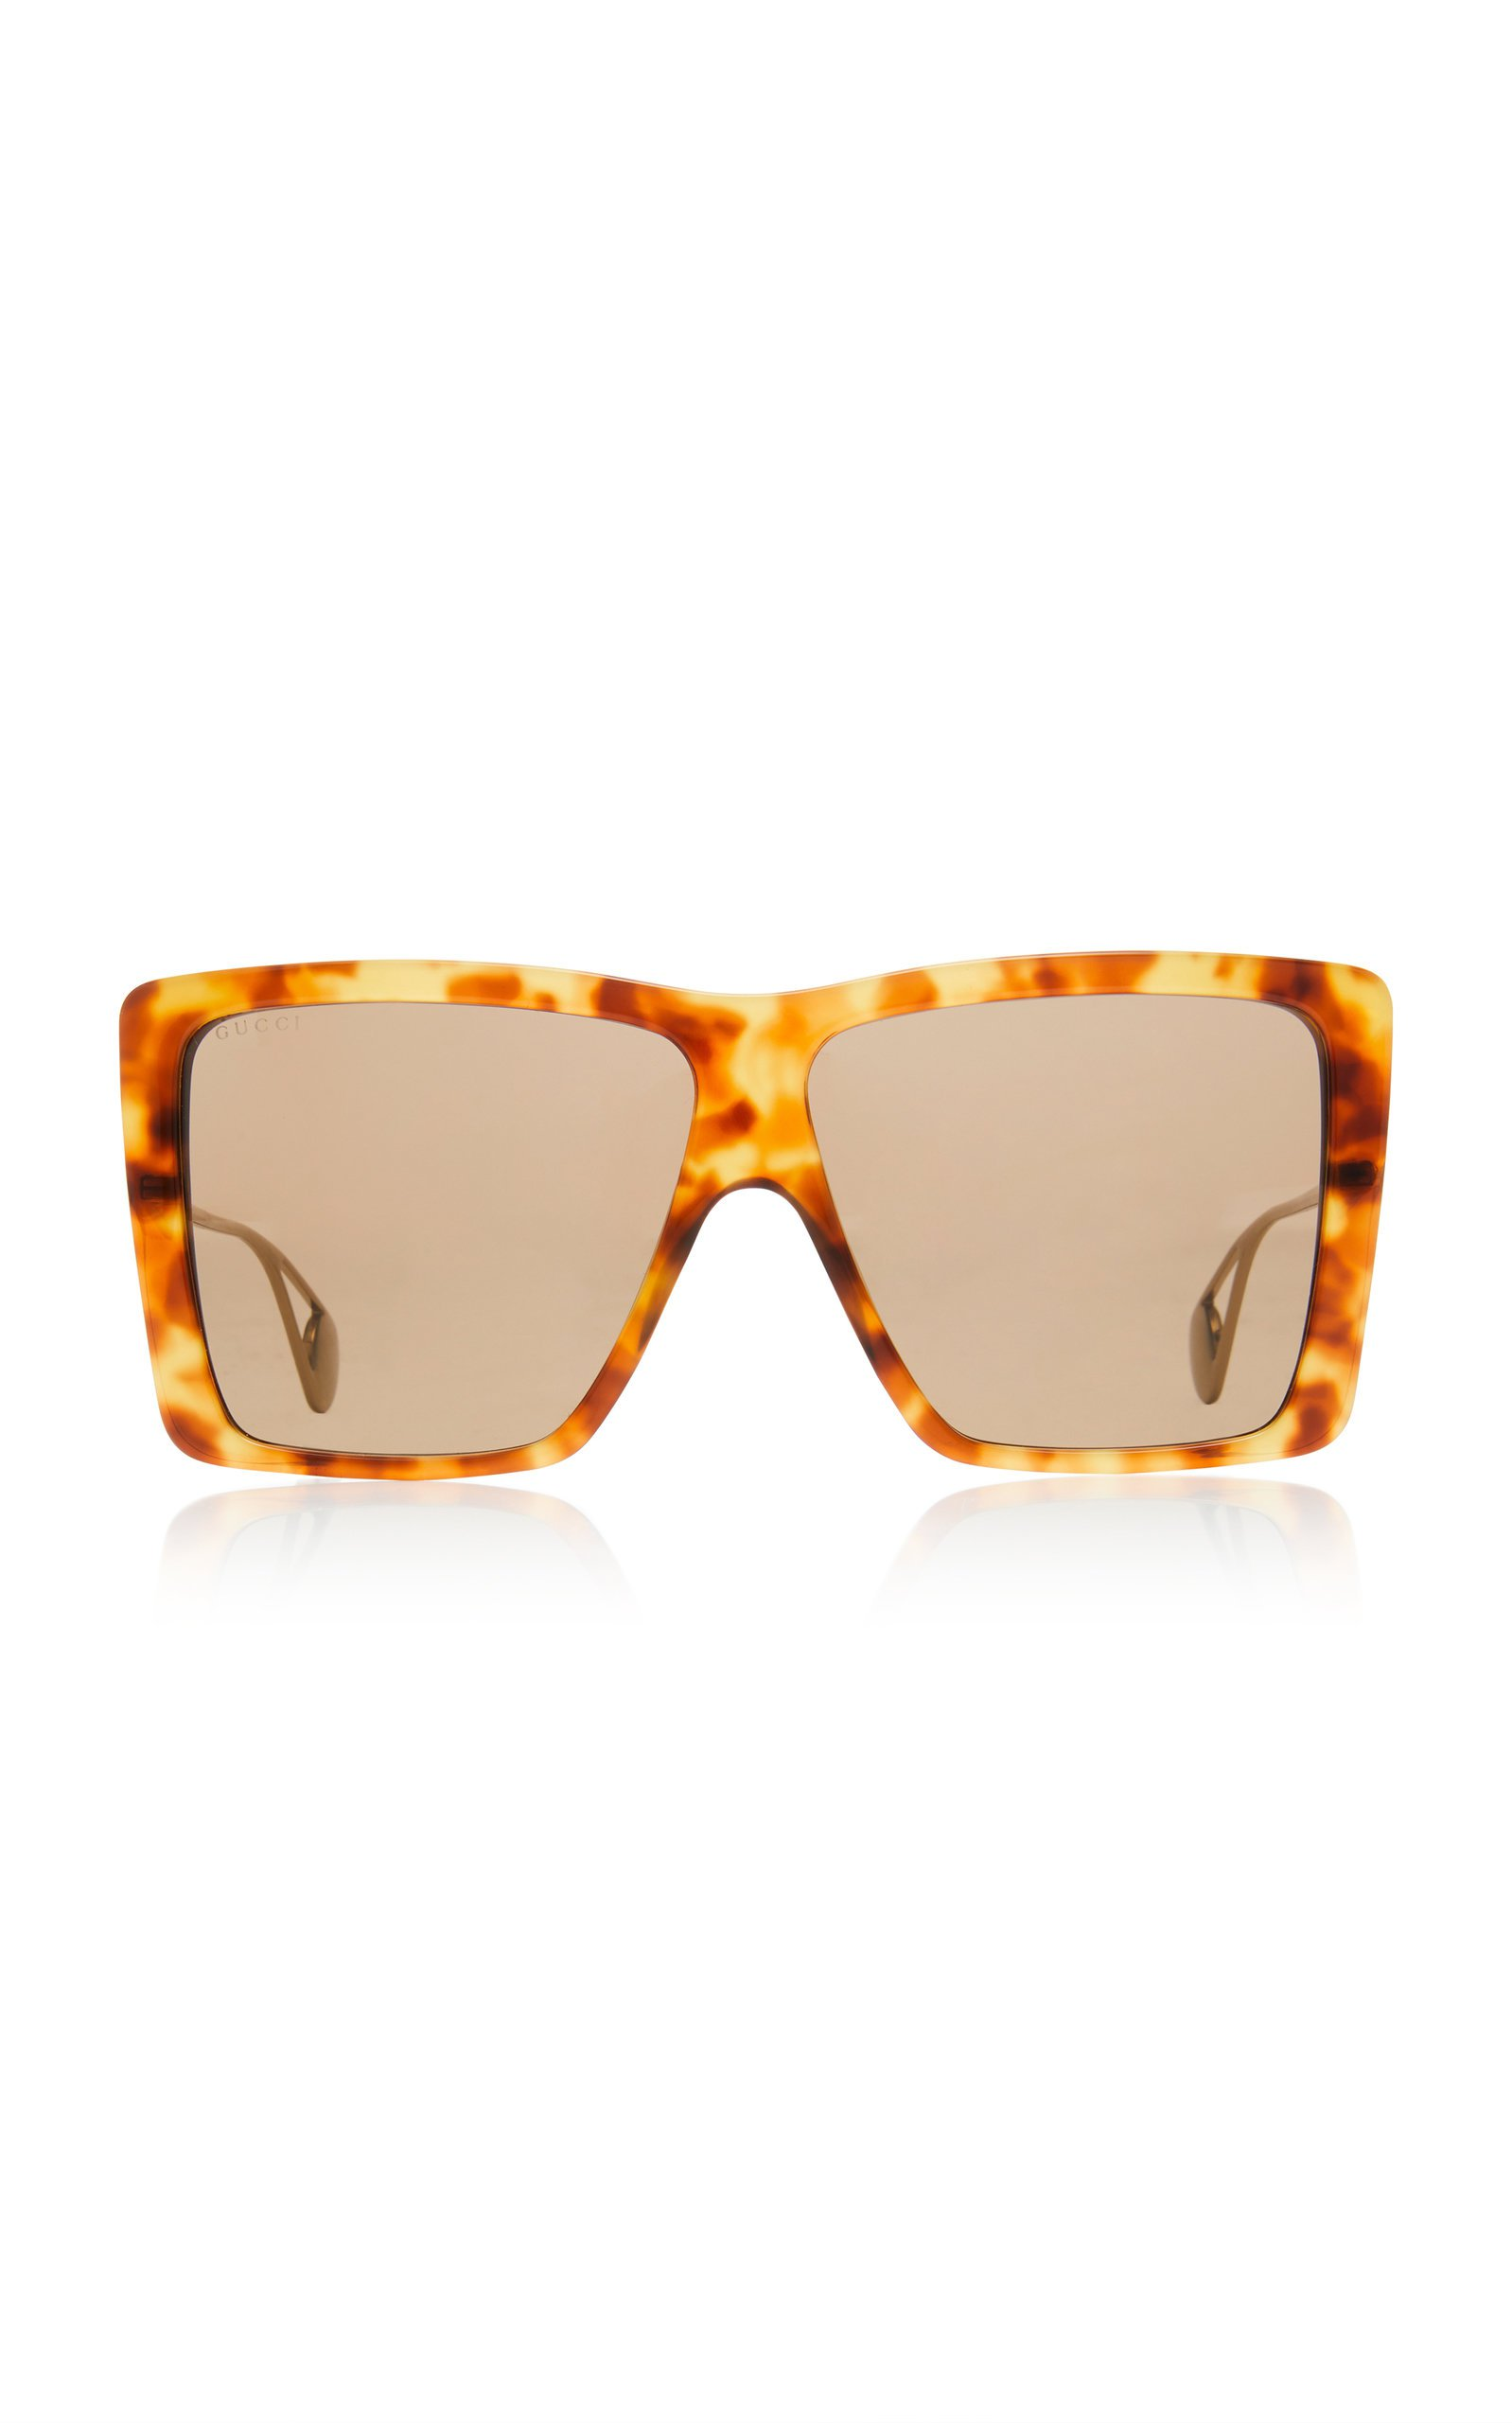 Gucci Evolution Oversized Square-Frame Sunglasses